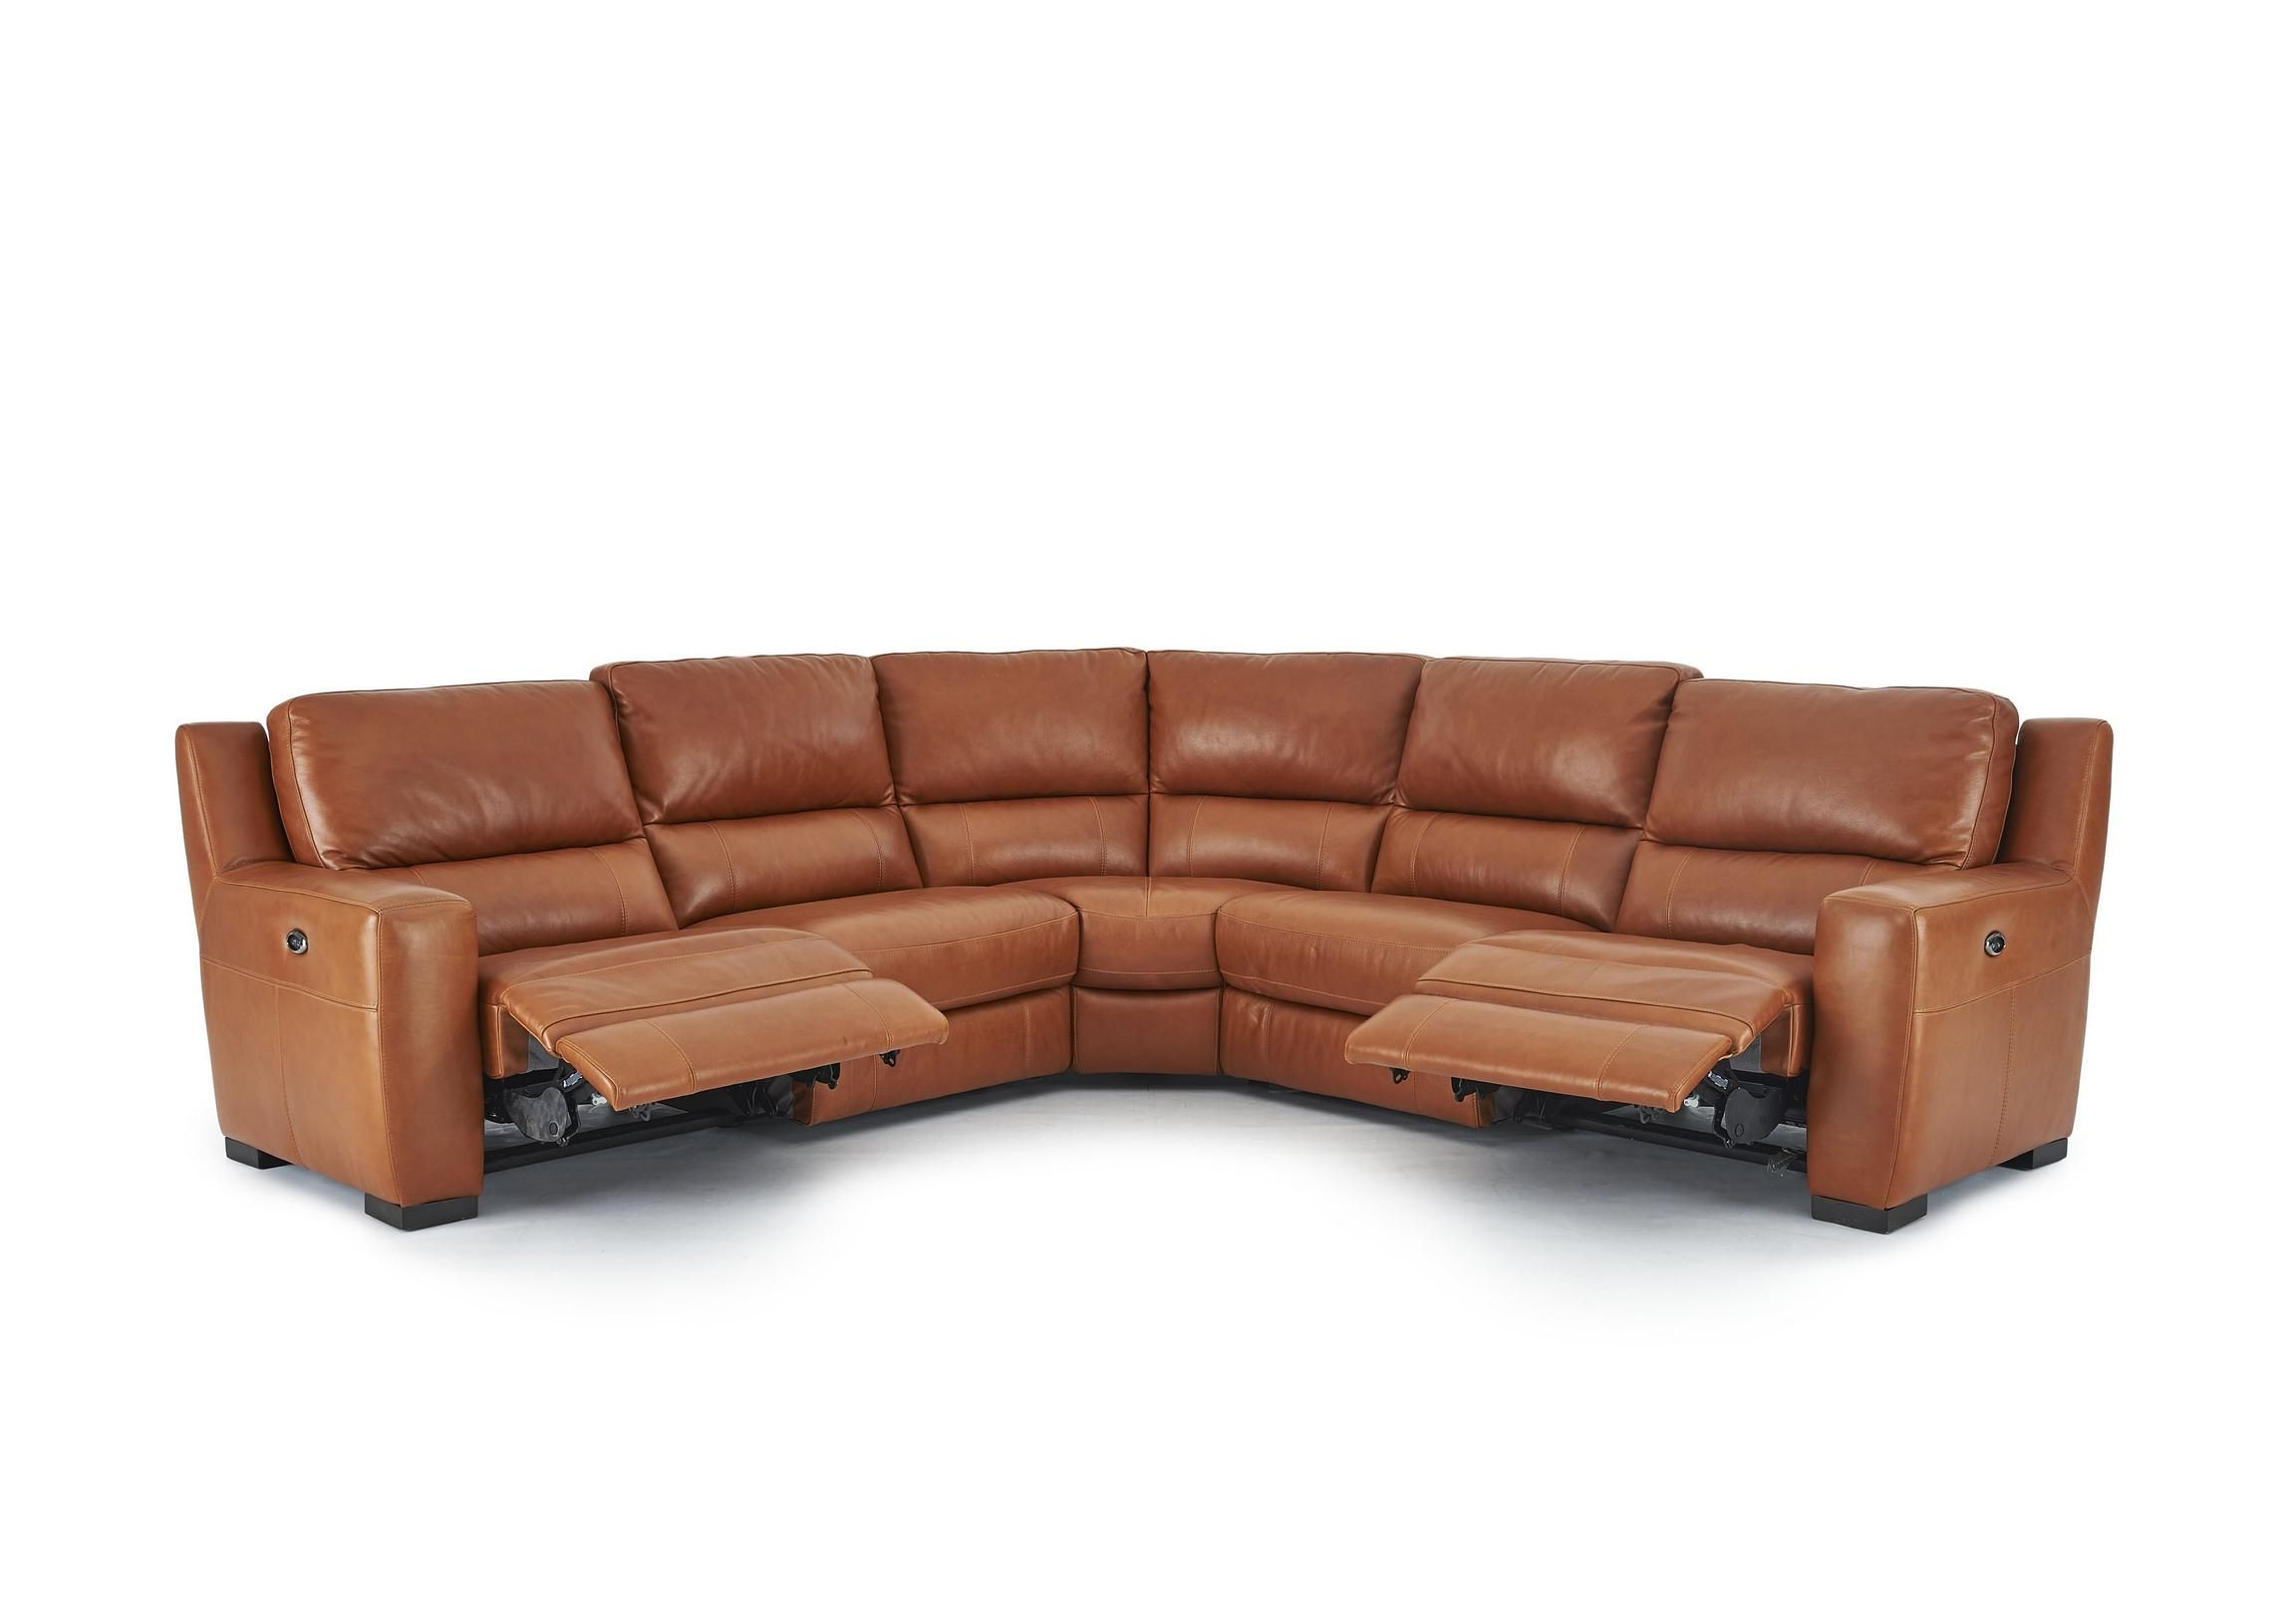 Rodeo Leather Recliner Corner Sofa Furniture Village Leather Recliner Recliner Corner Sofa Corner Sofa